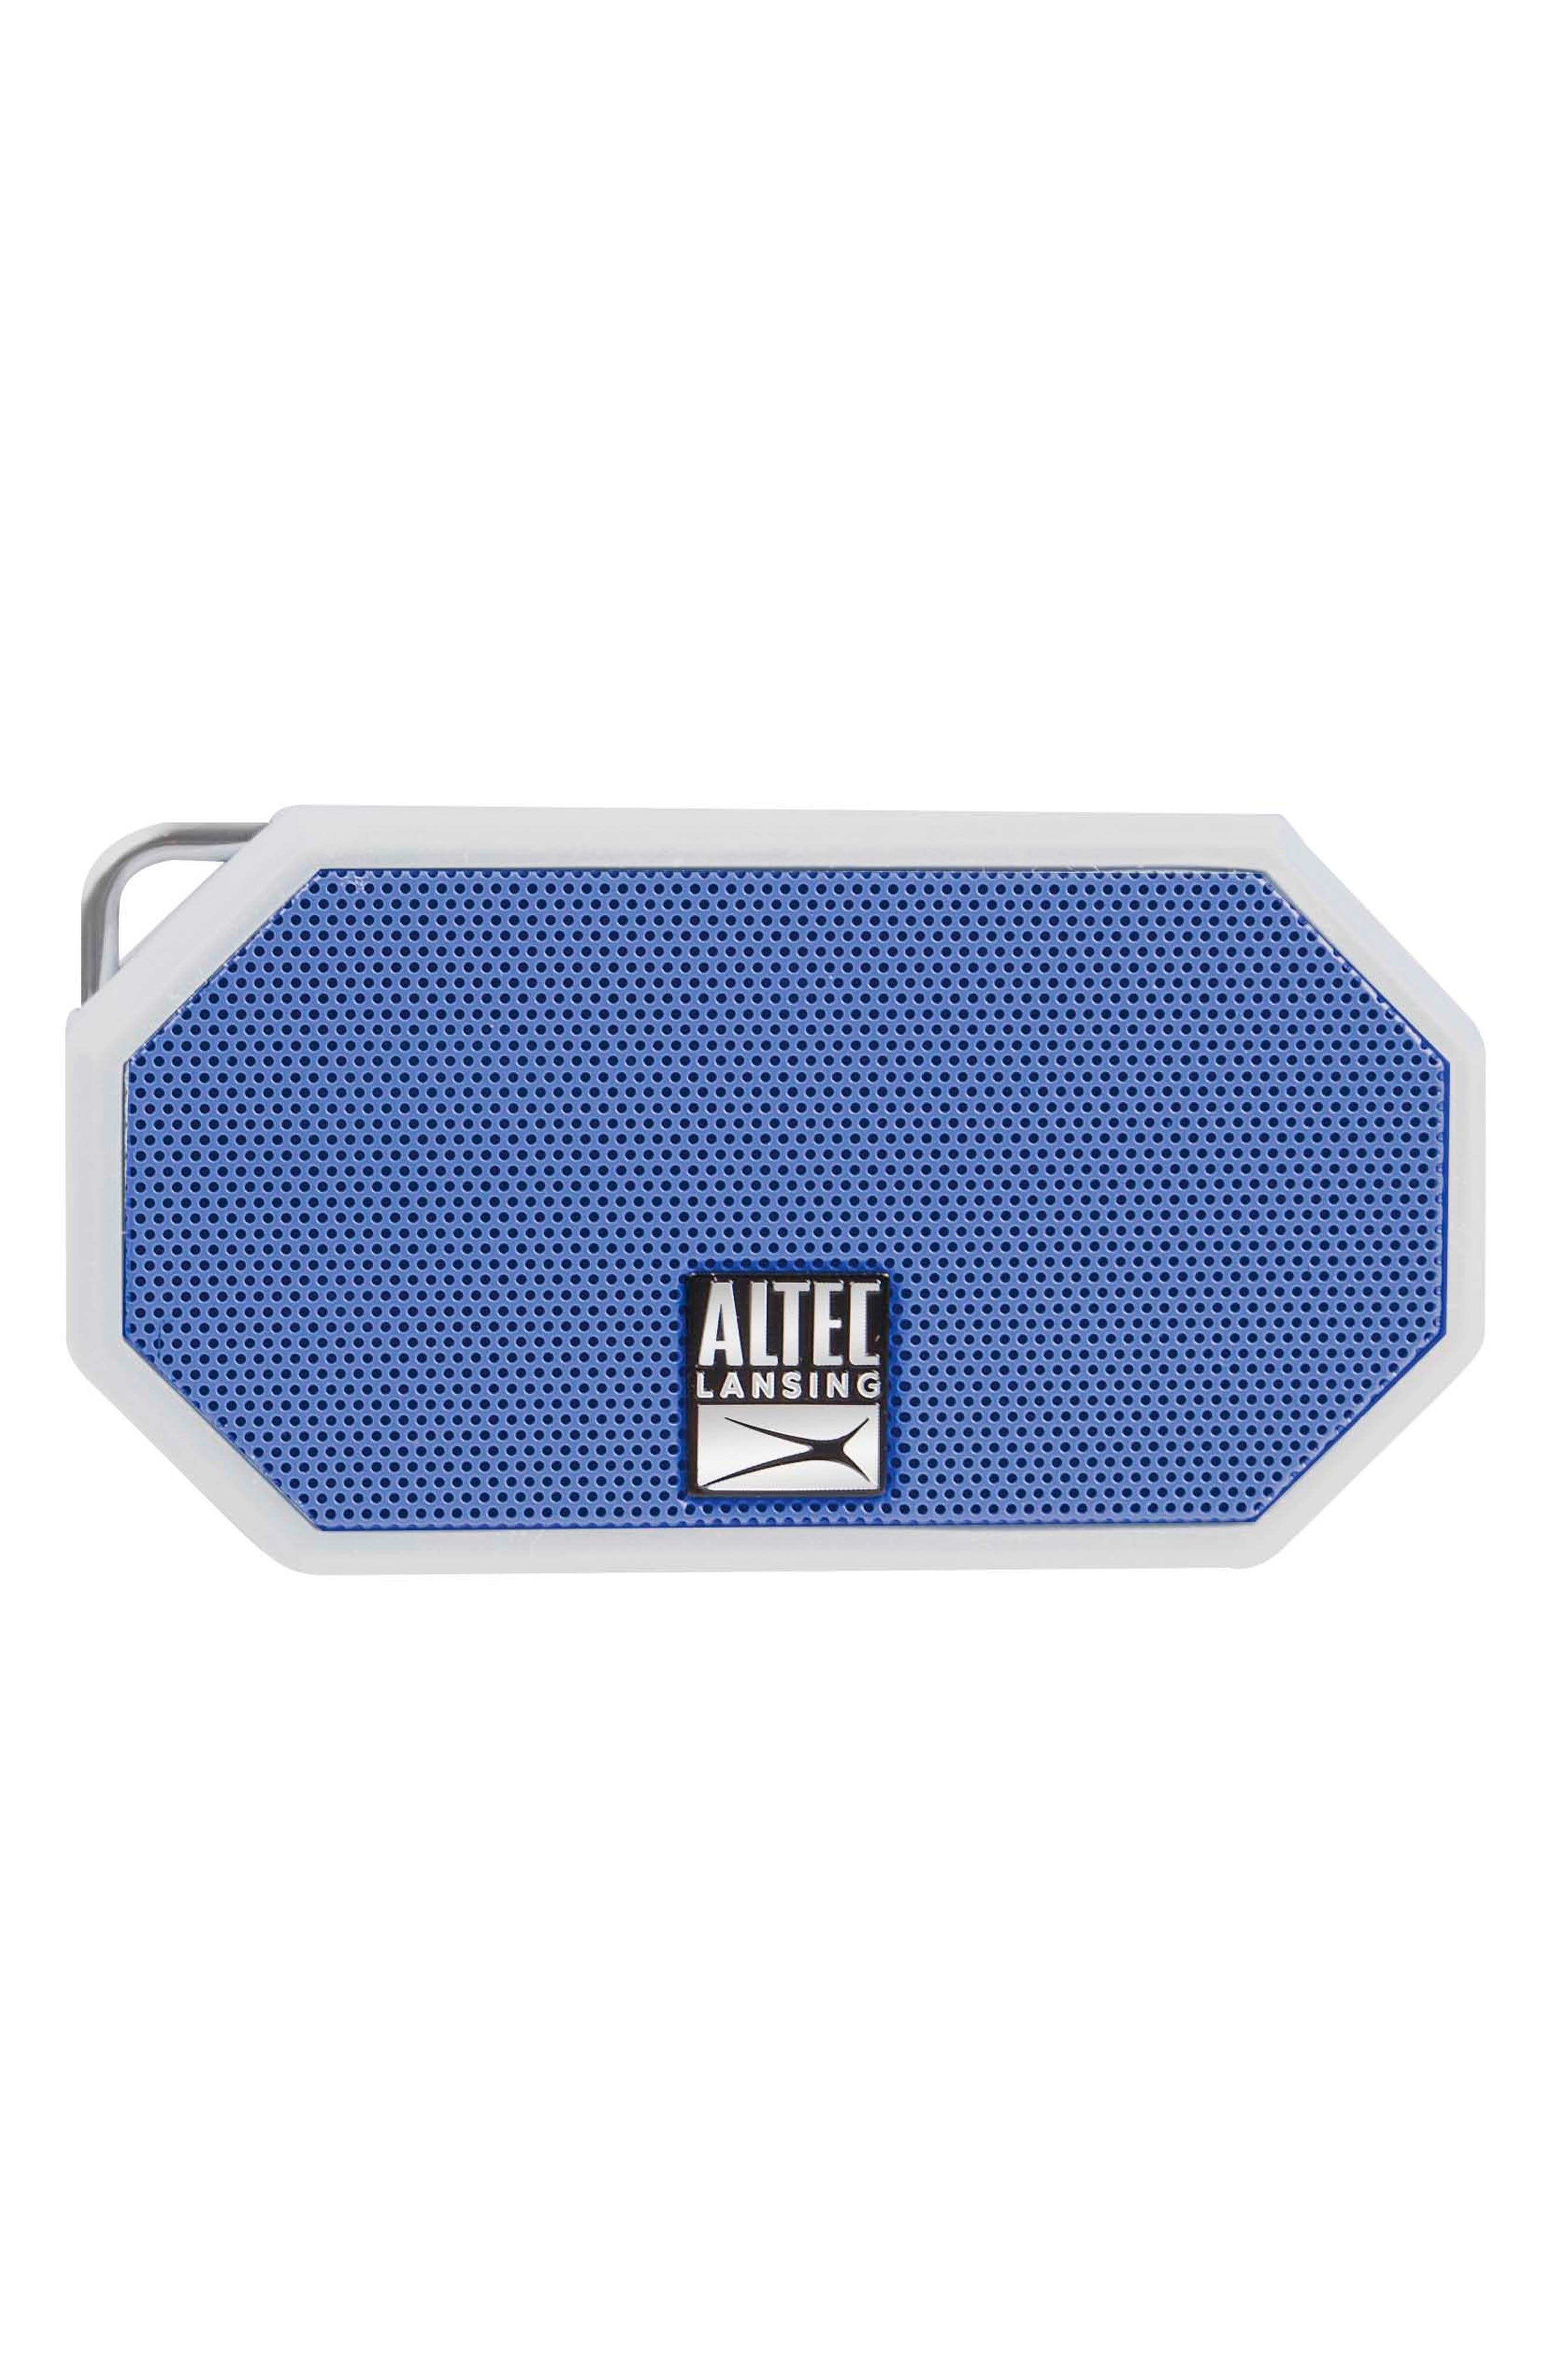 Main Image - Altec Lansing Mini H2O 3 Waterproof Compact Speaker